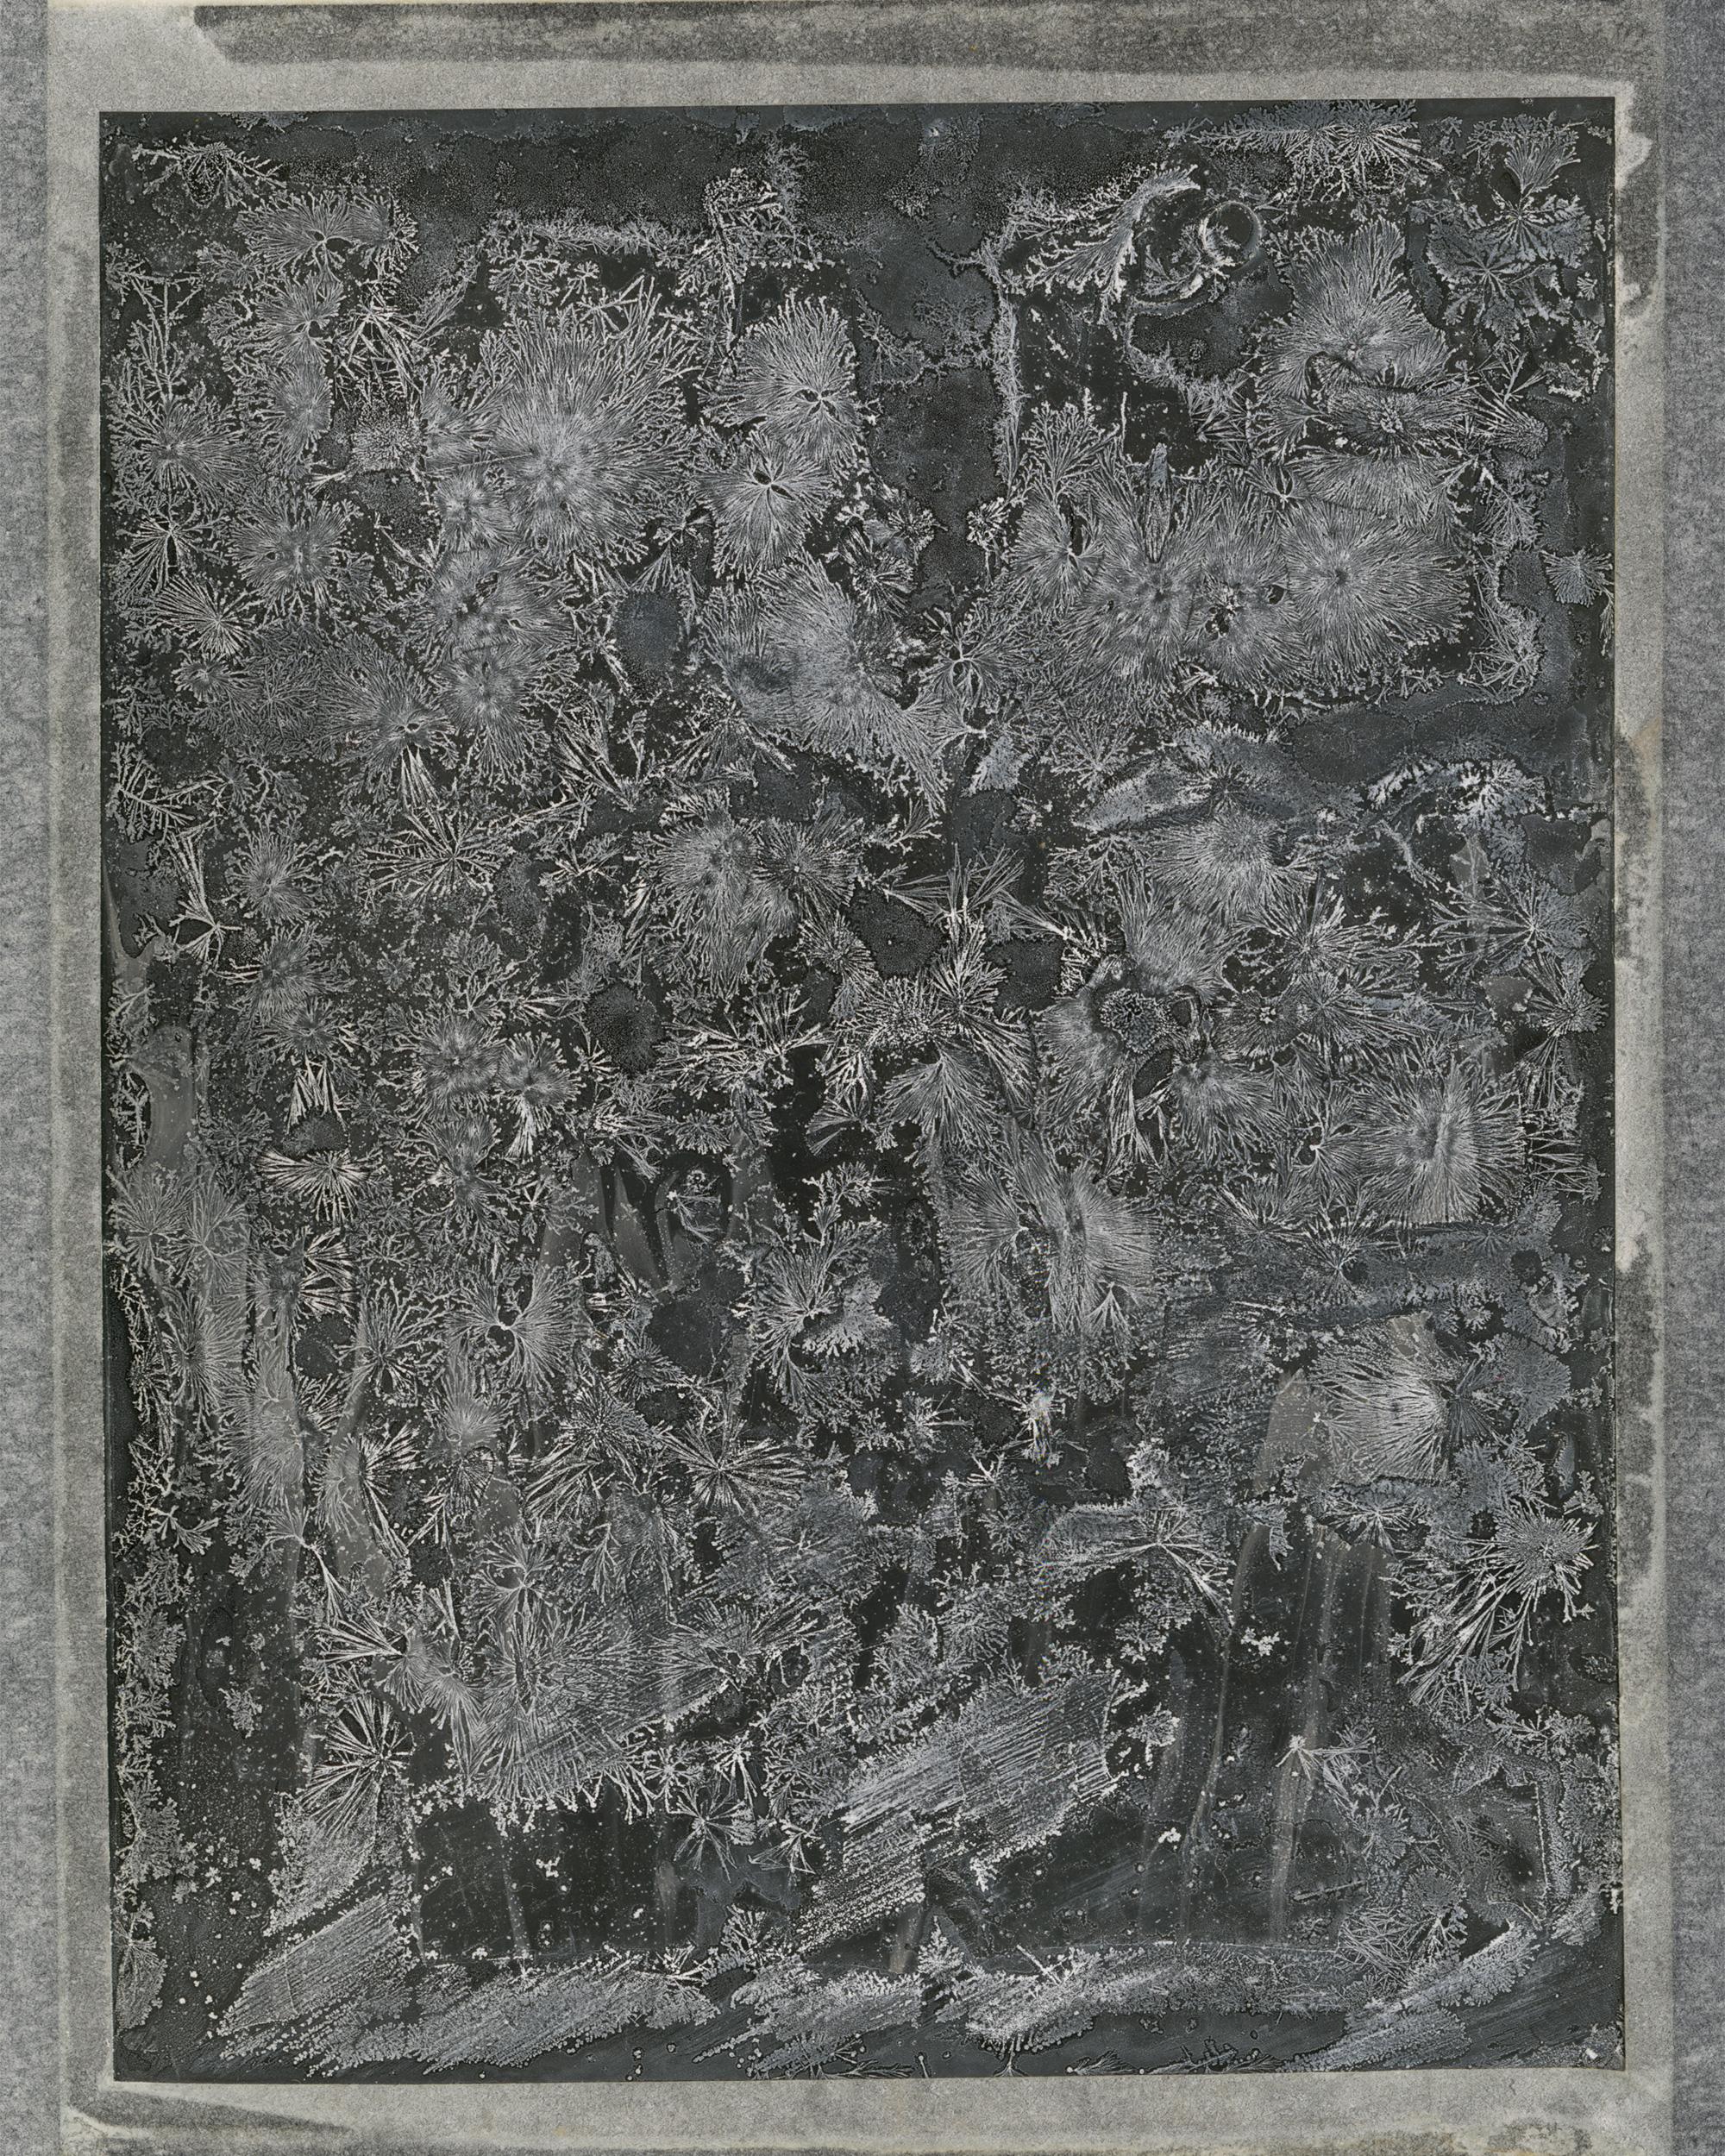 Untitled 96cm x 120cm